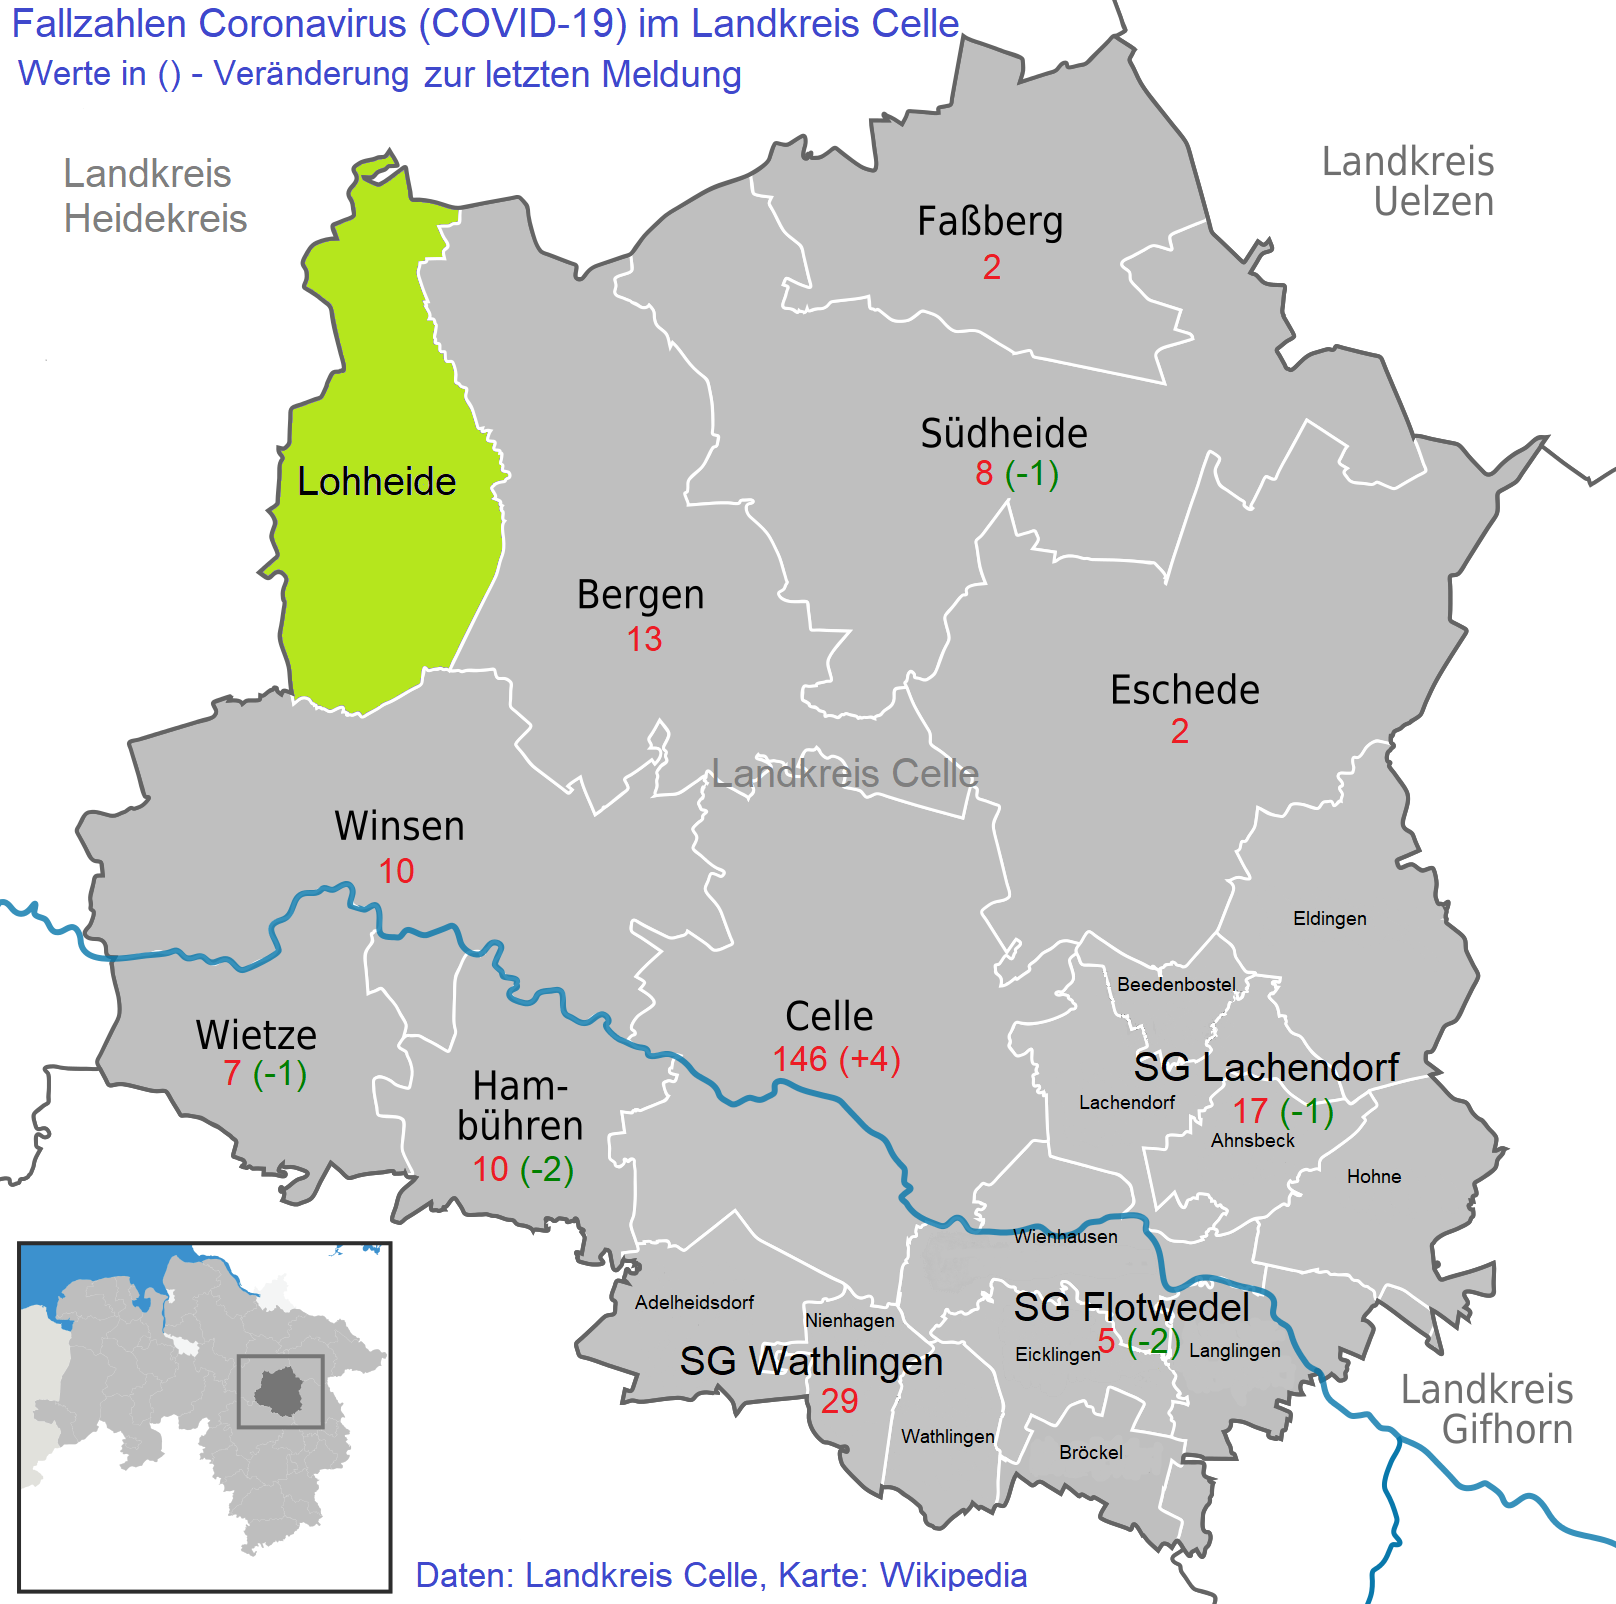 karte_lk_celle_wikipedia_26112020